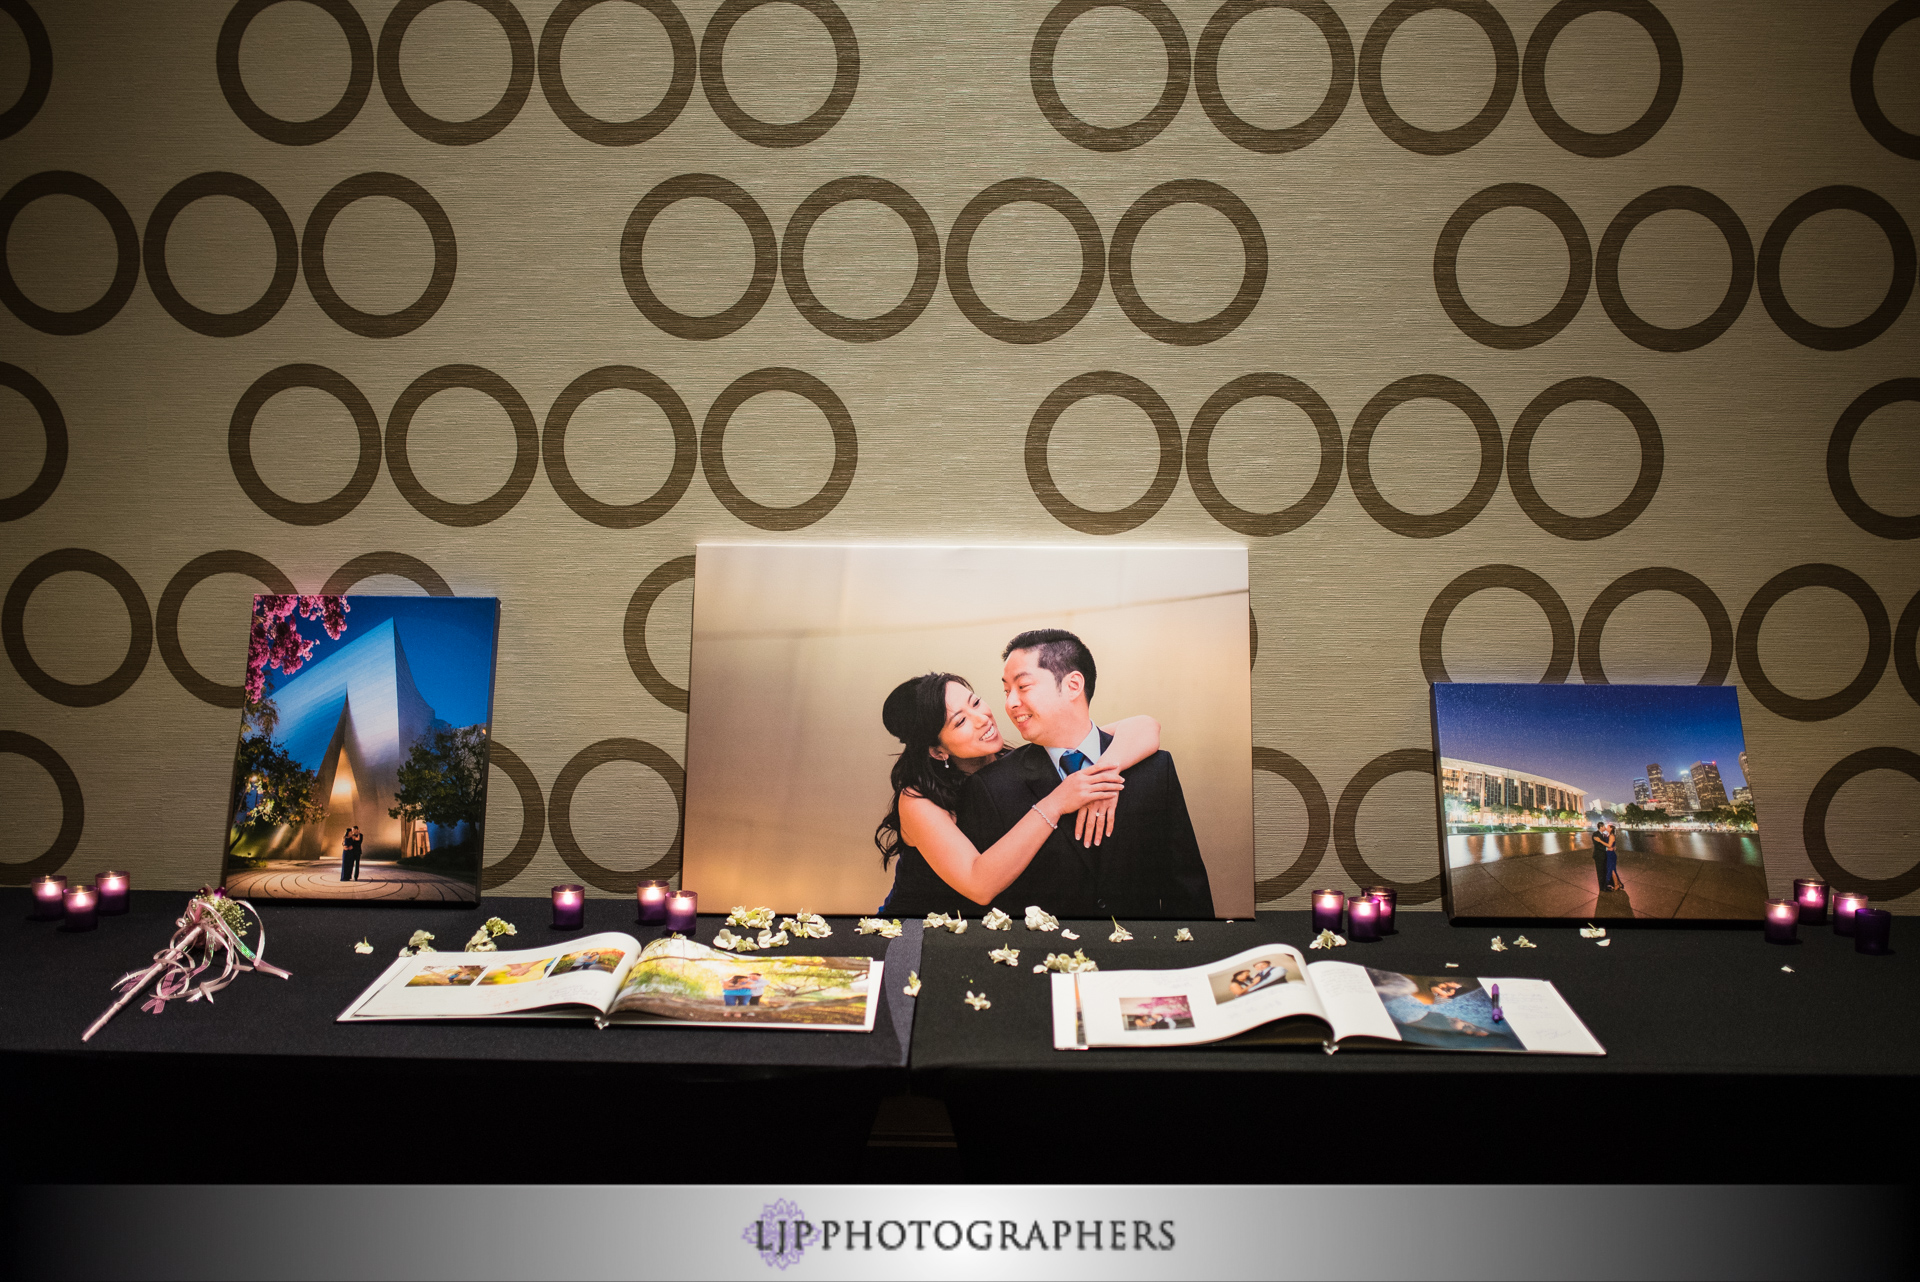 26-jw-marriott-los-angeles-wedding-photographer-wedding-reception-photos